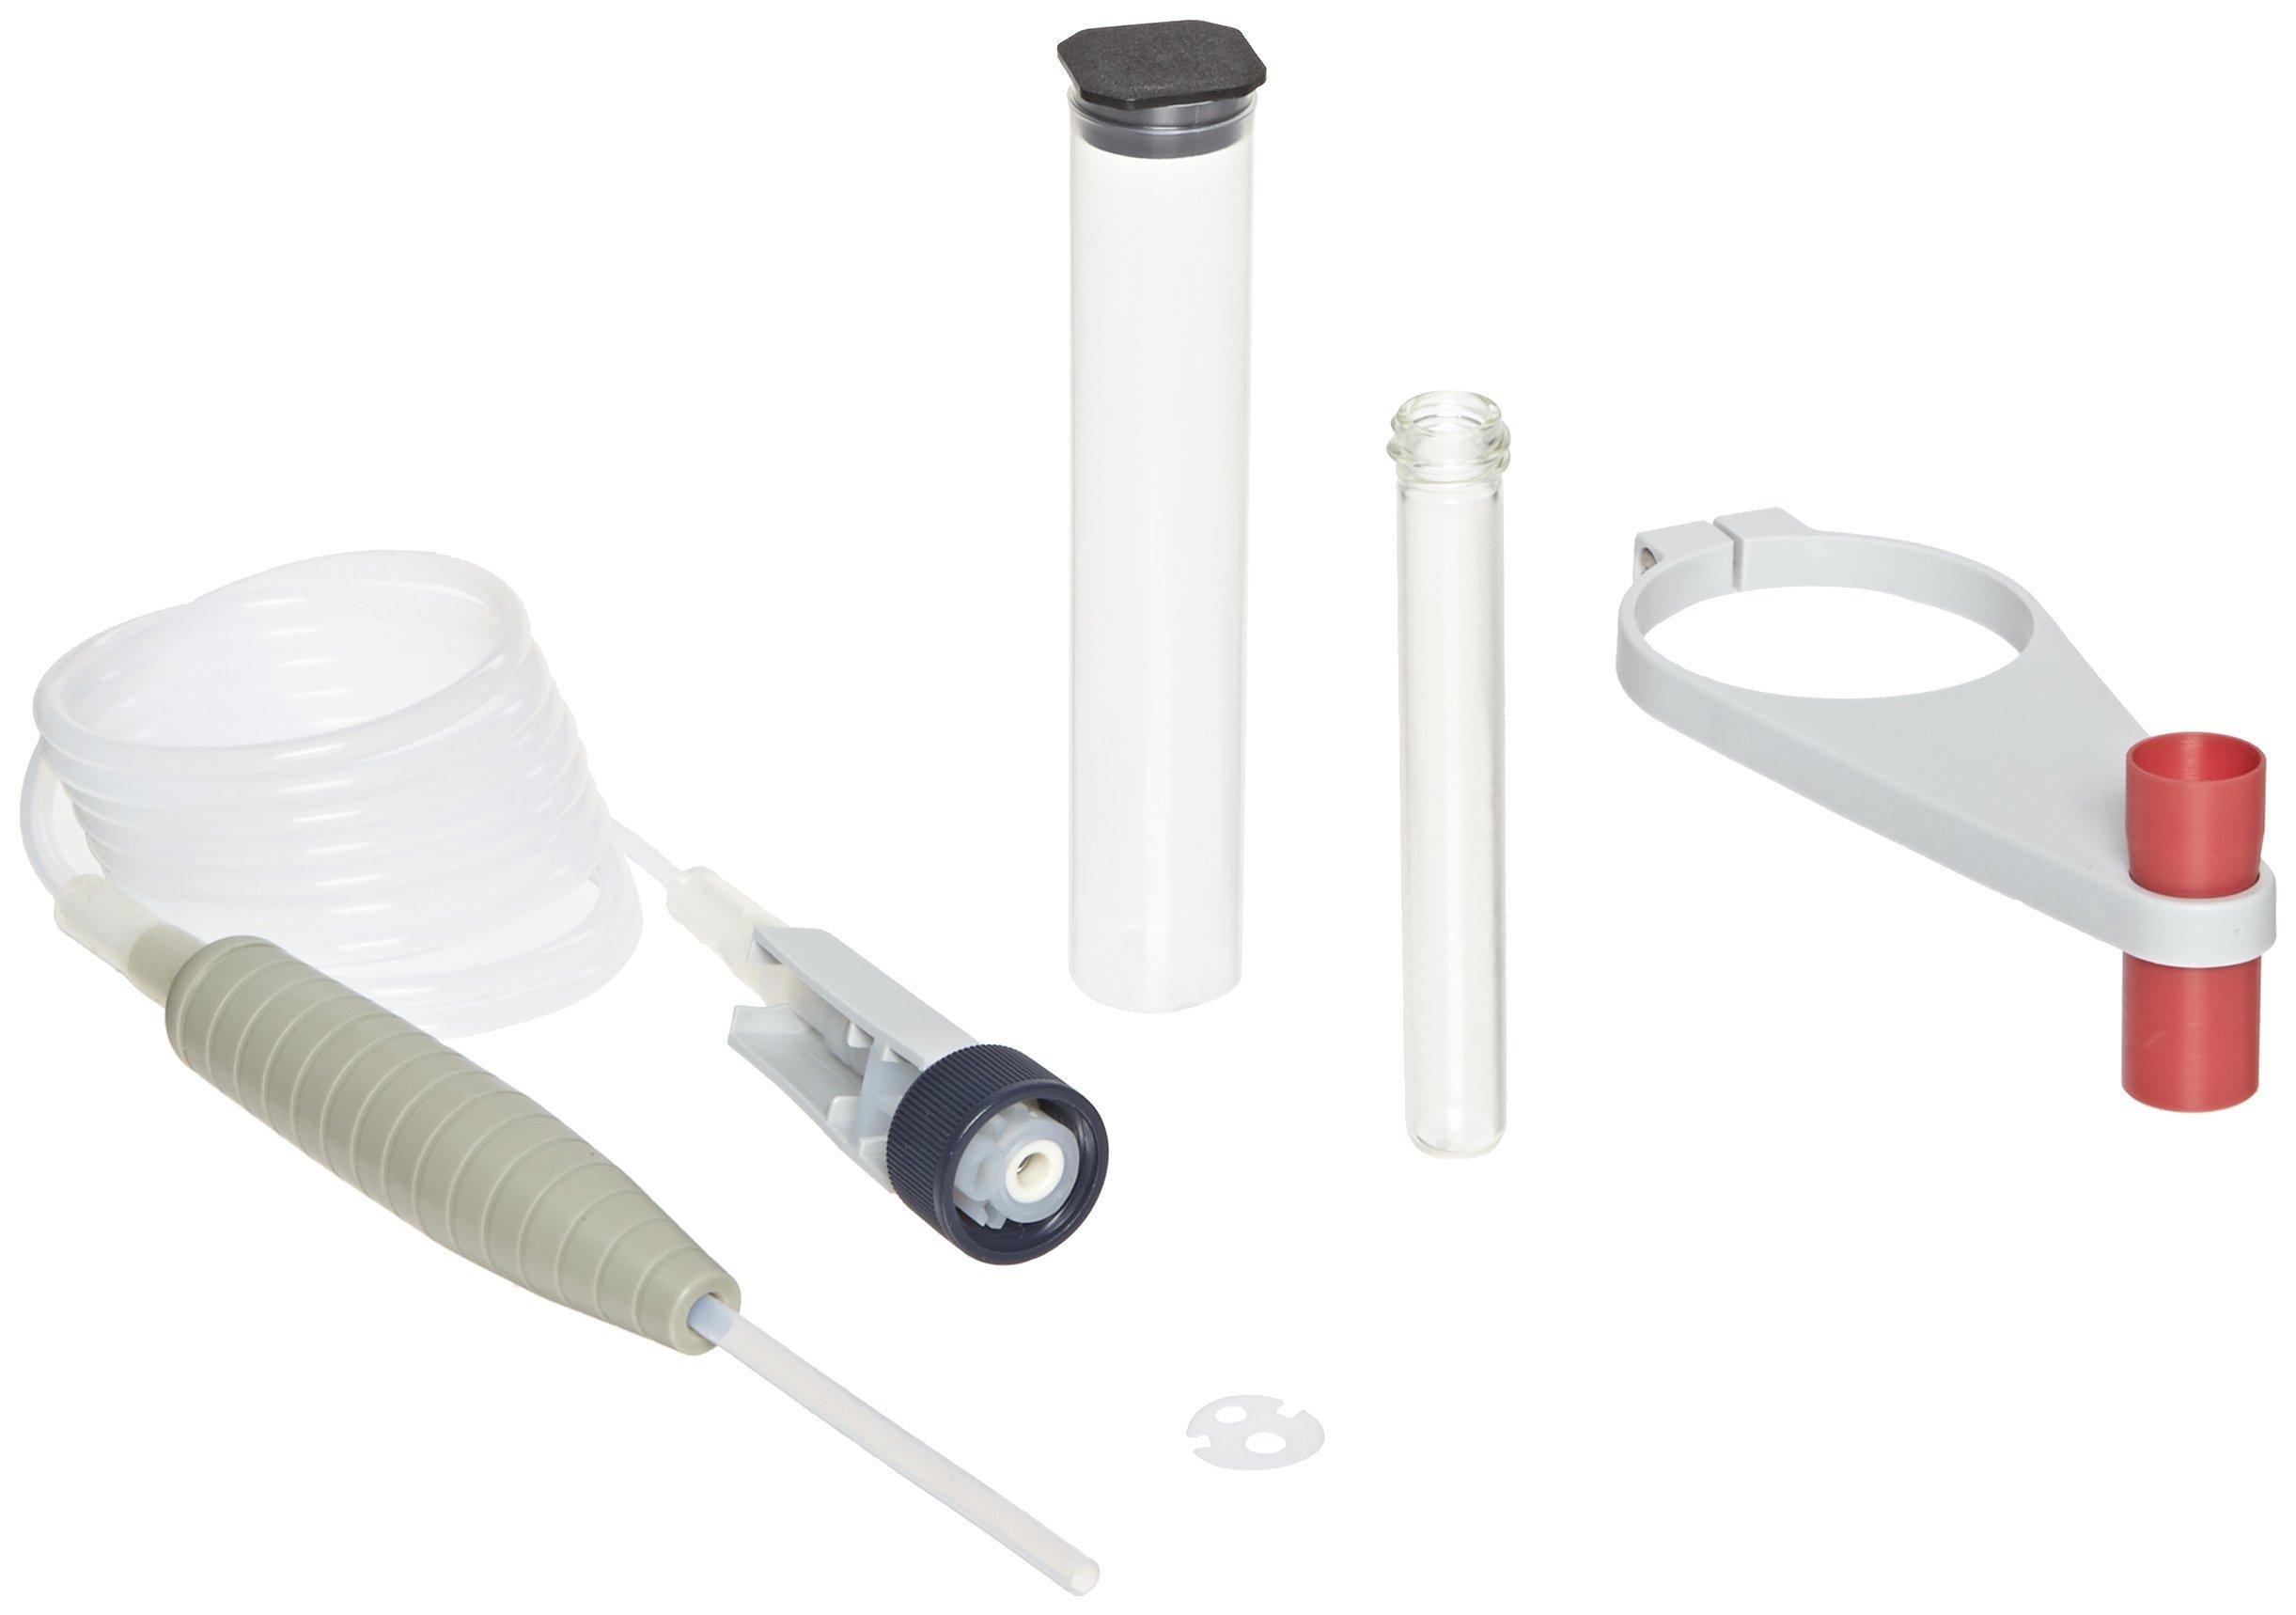 BrandTech 707926 Flexible Discharge Tubes for Dispensette III and Dispensette Organic Bottletop Dispensers, Nominal Volume 25, 50, 100mL